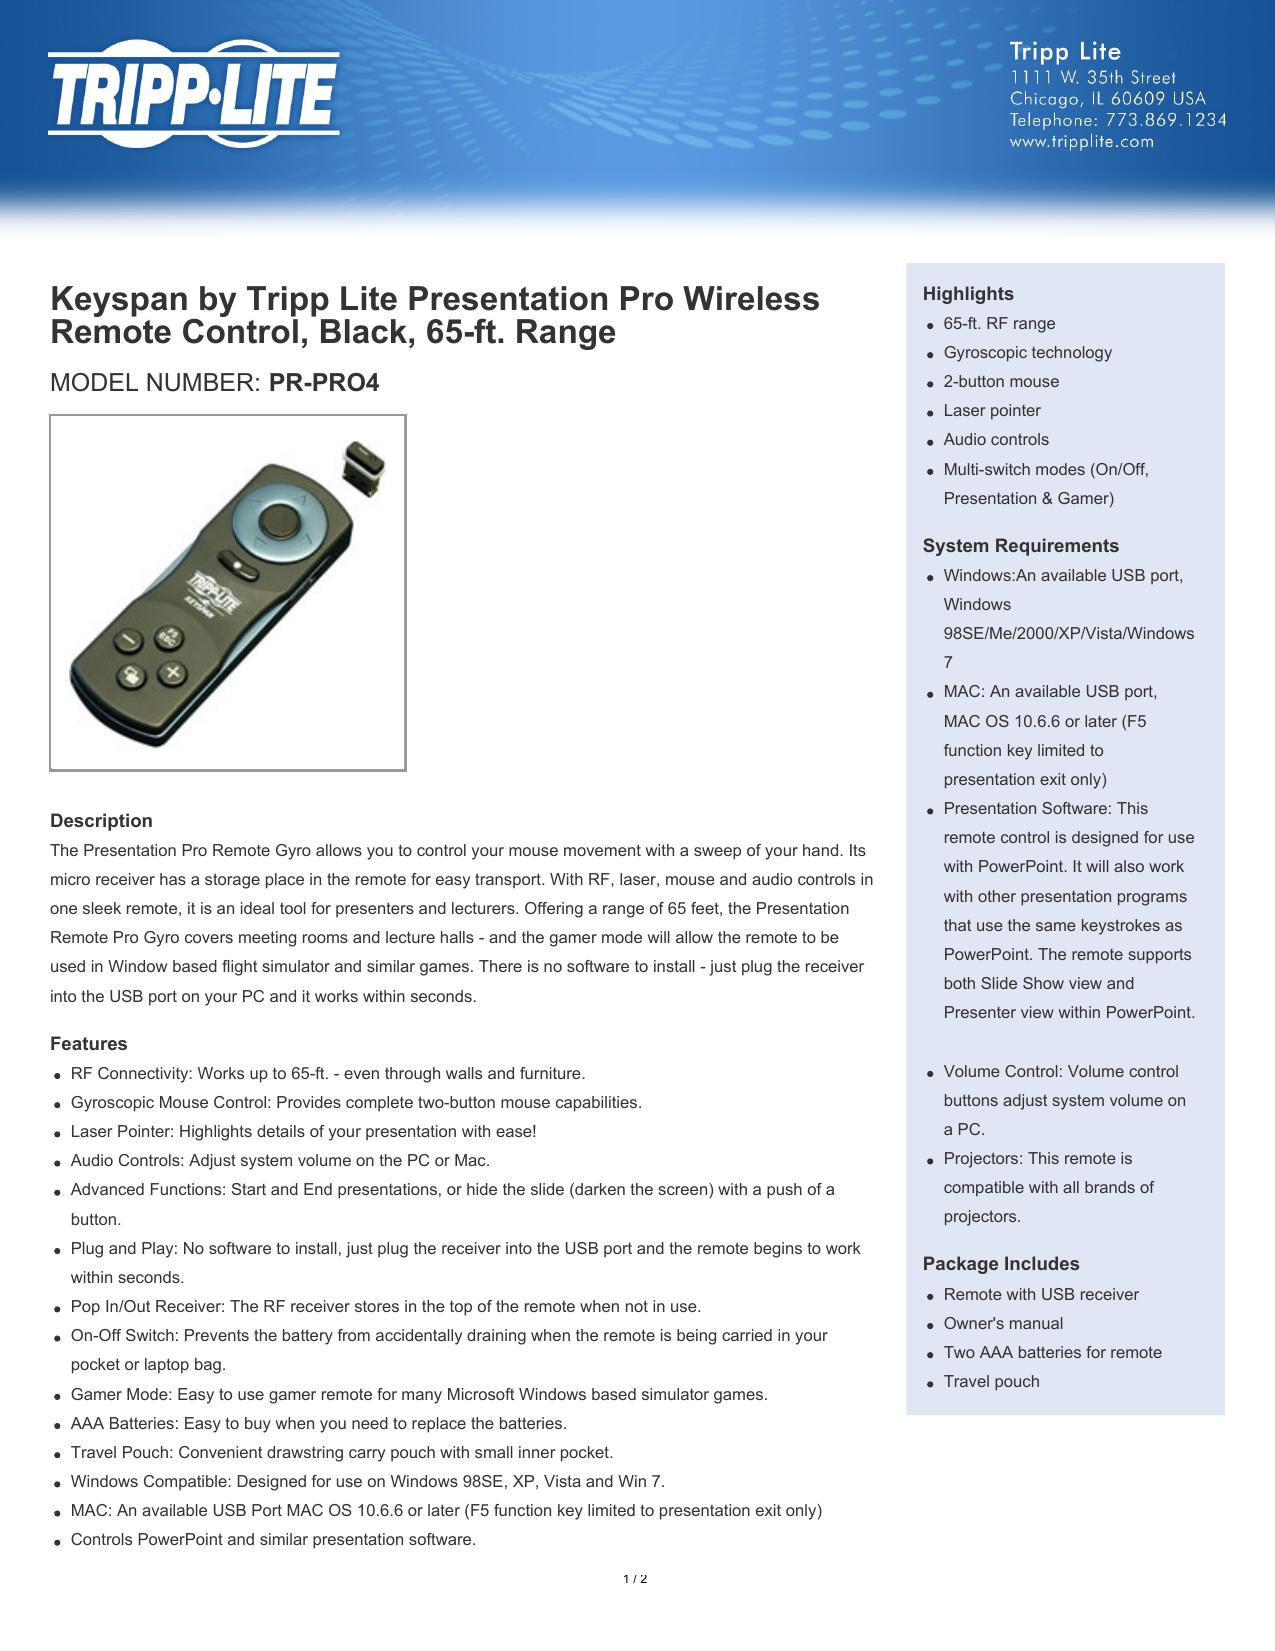 Keyspan by Tripp Lite Presentation Pro Wireless Remote Control